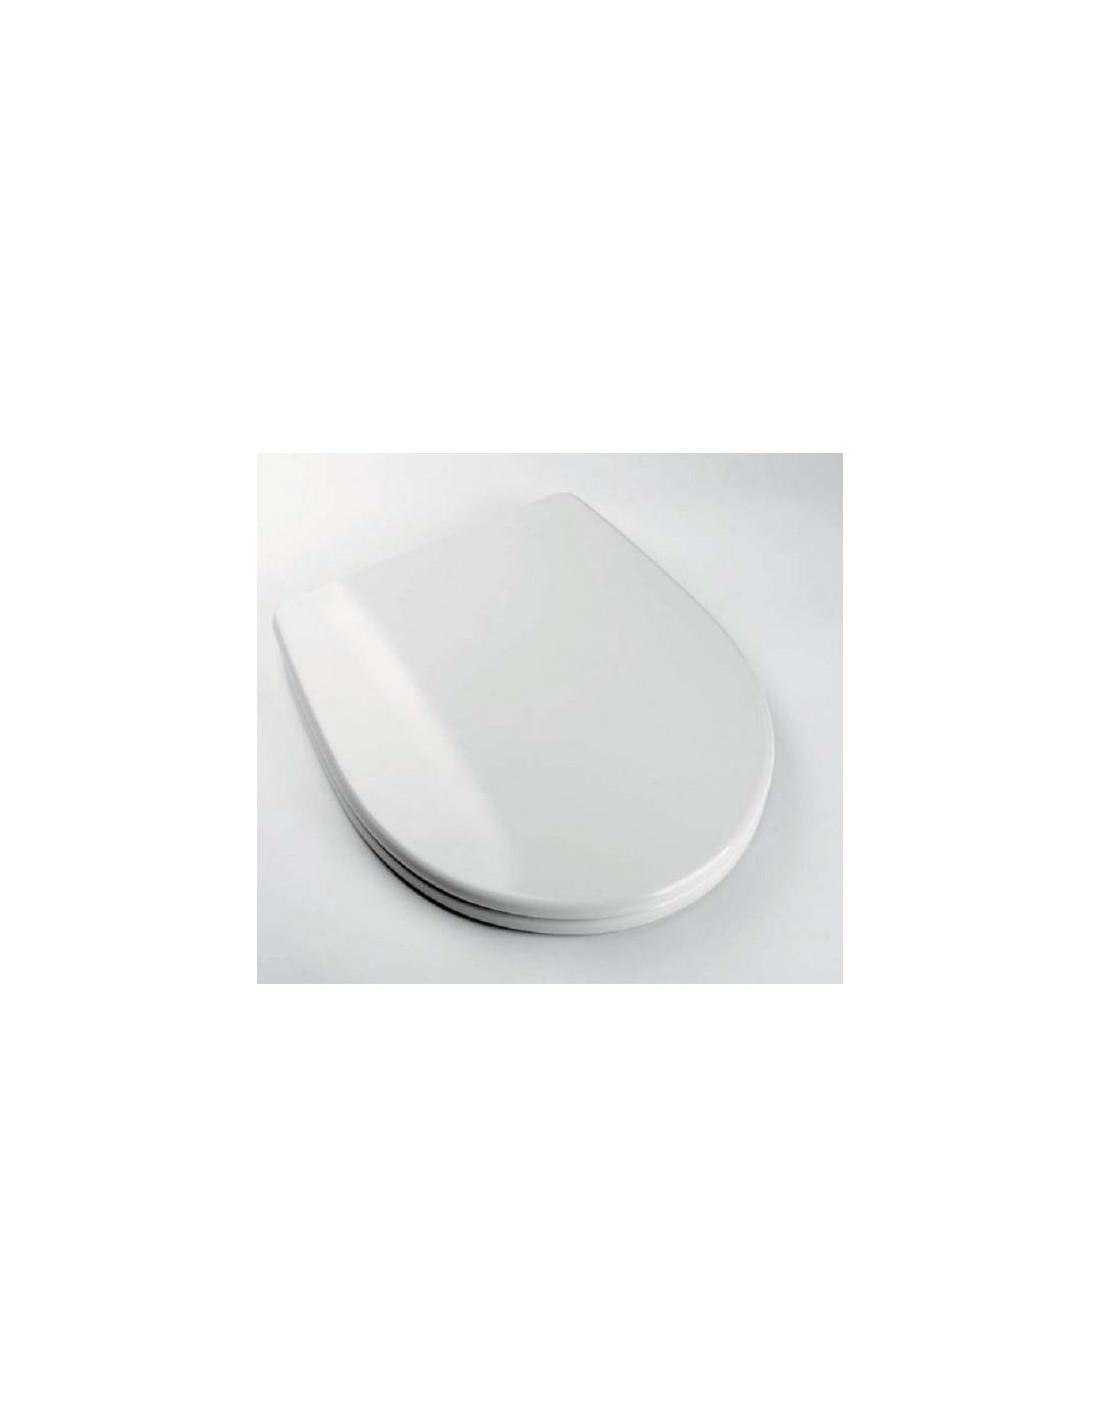 abattant du wc sanitana jazz adaptable in duroplast. Black Bedroom Furniture Sets. Home Design Ideas